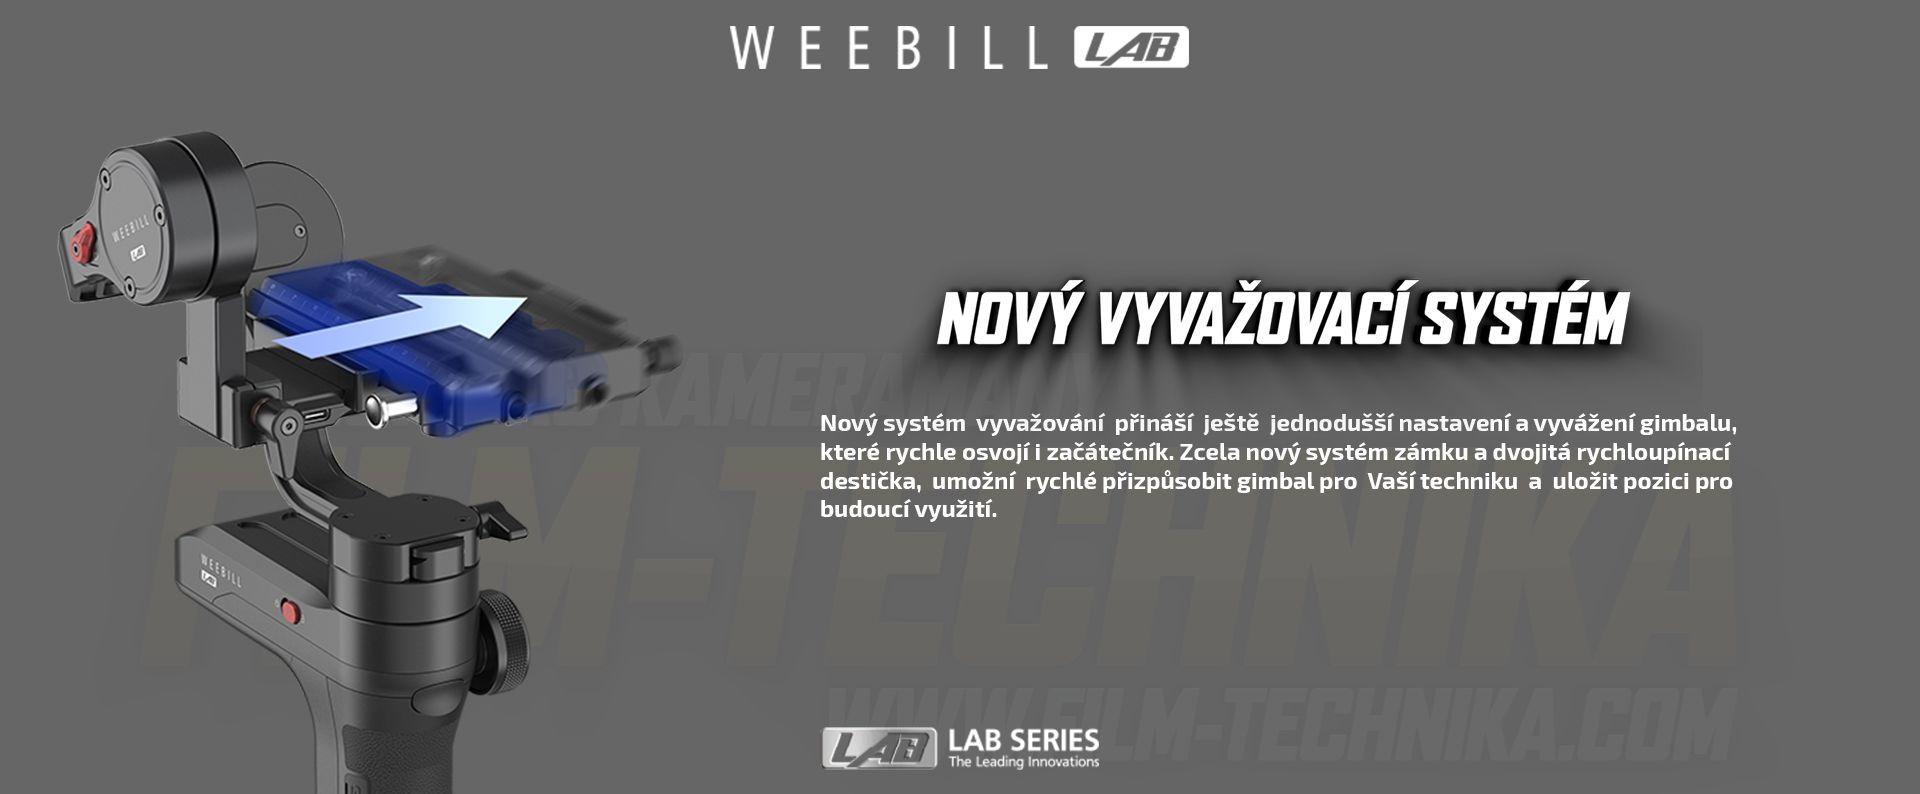 film-technika-zhiyun-weebill-lab-intext4